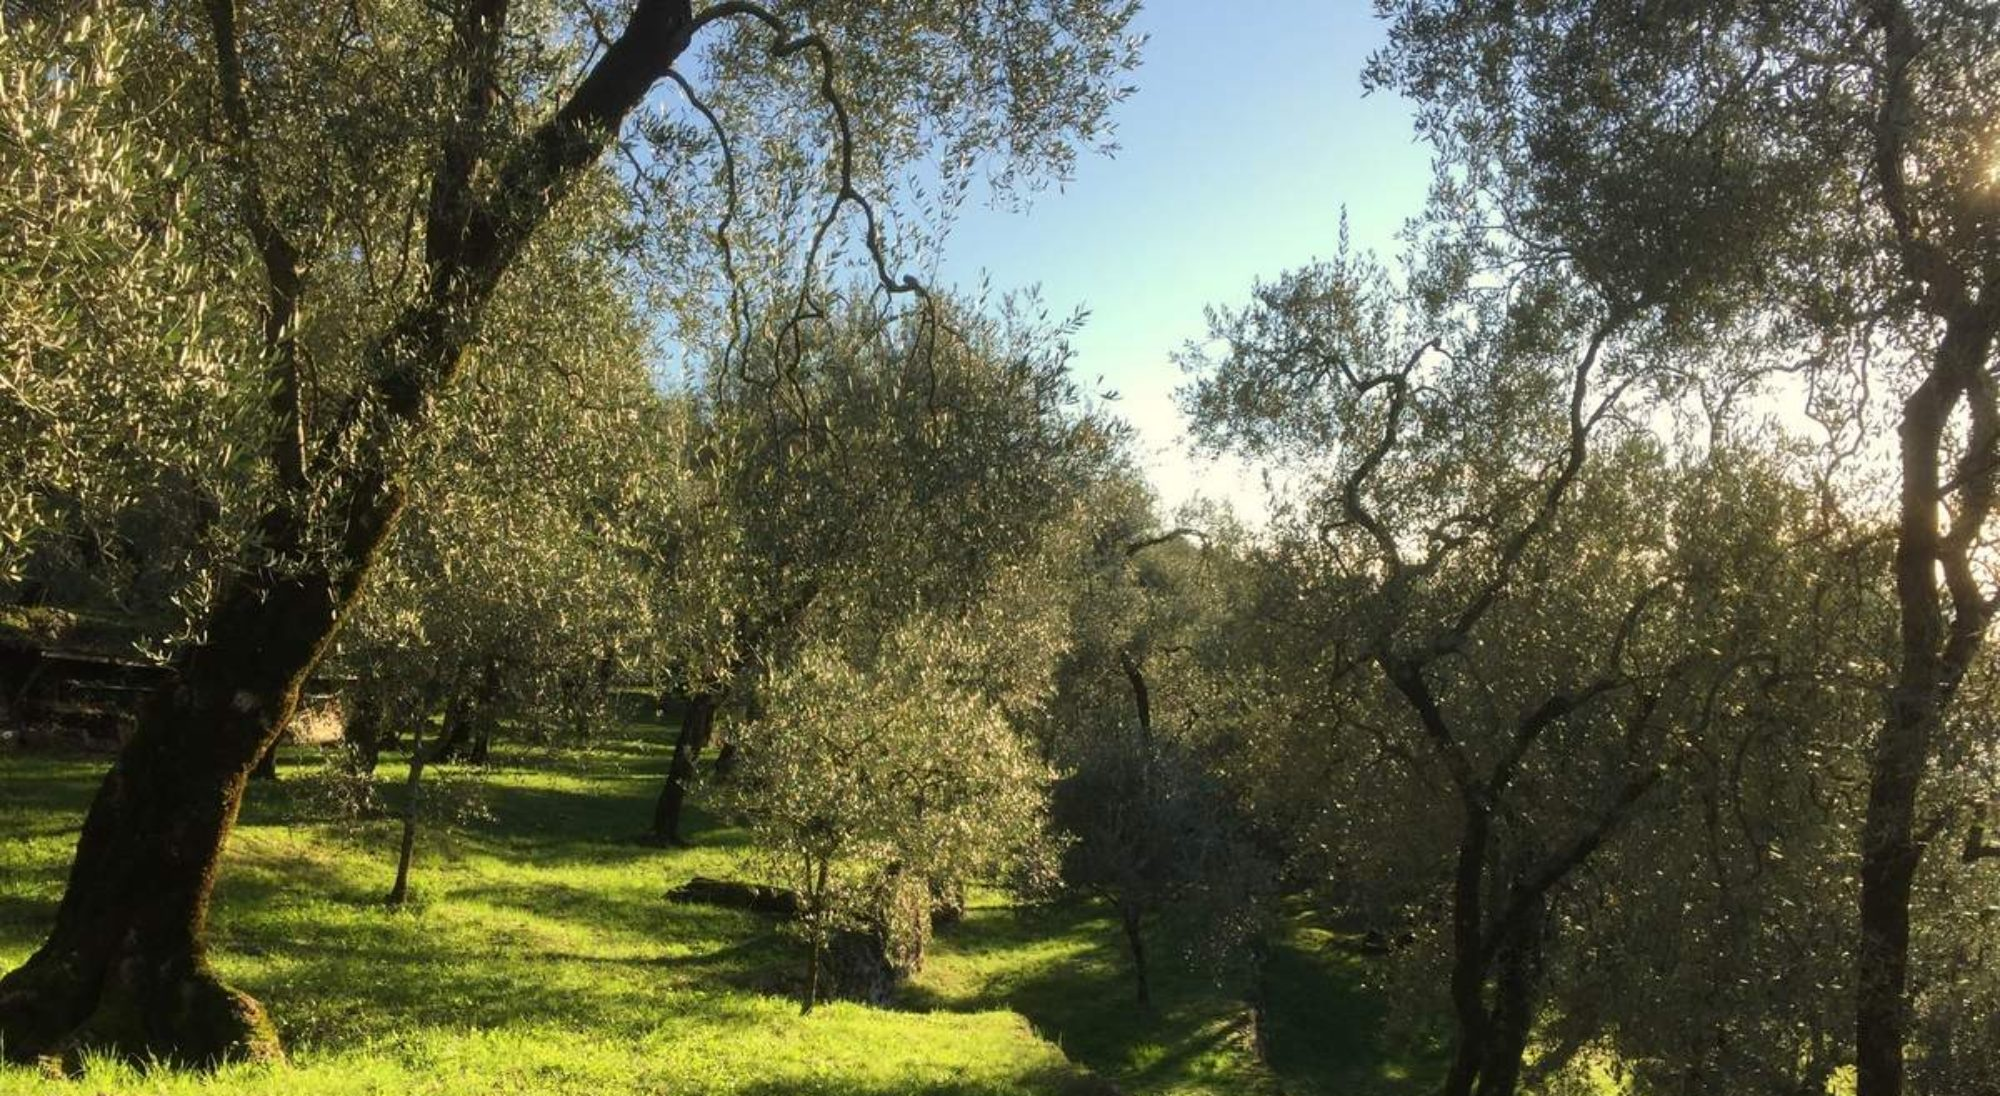 Olivenöl aus eigenem Anbau!